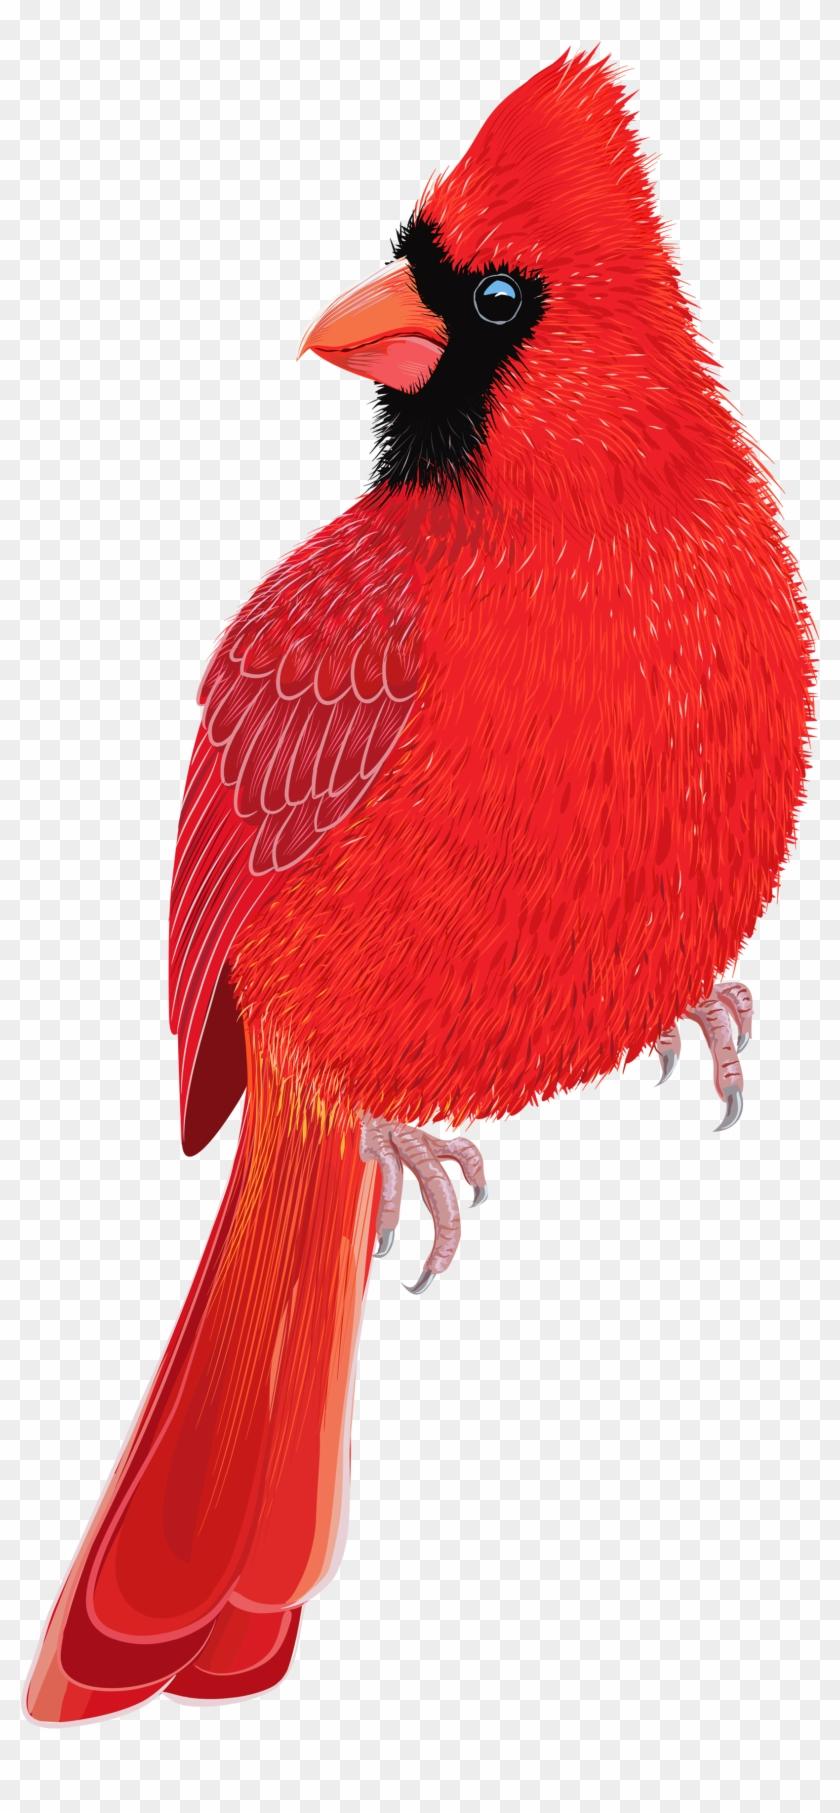 Red Bird Png Clipart Image - Pajaros Rojo #275682